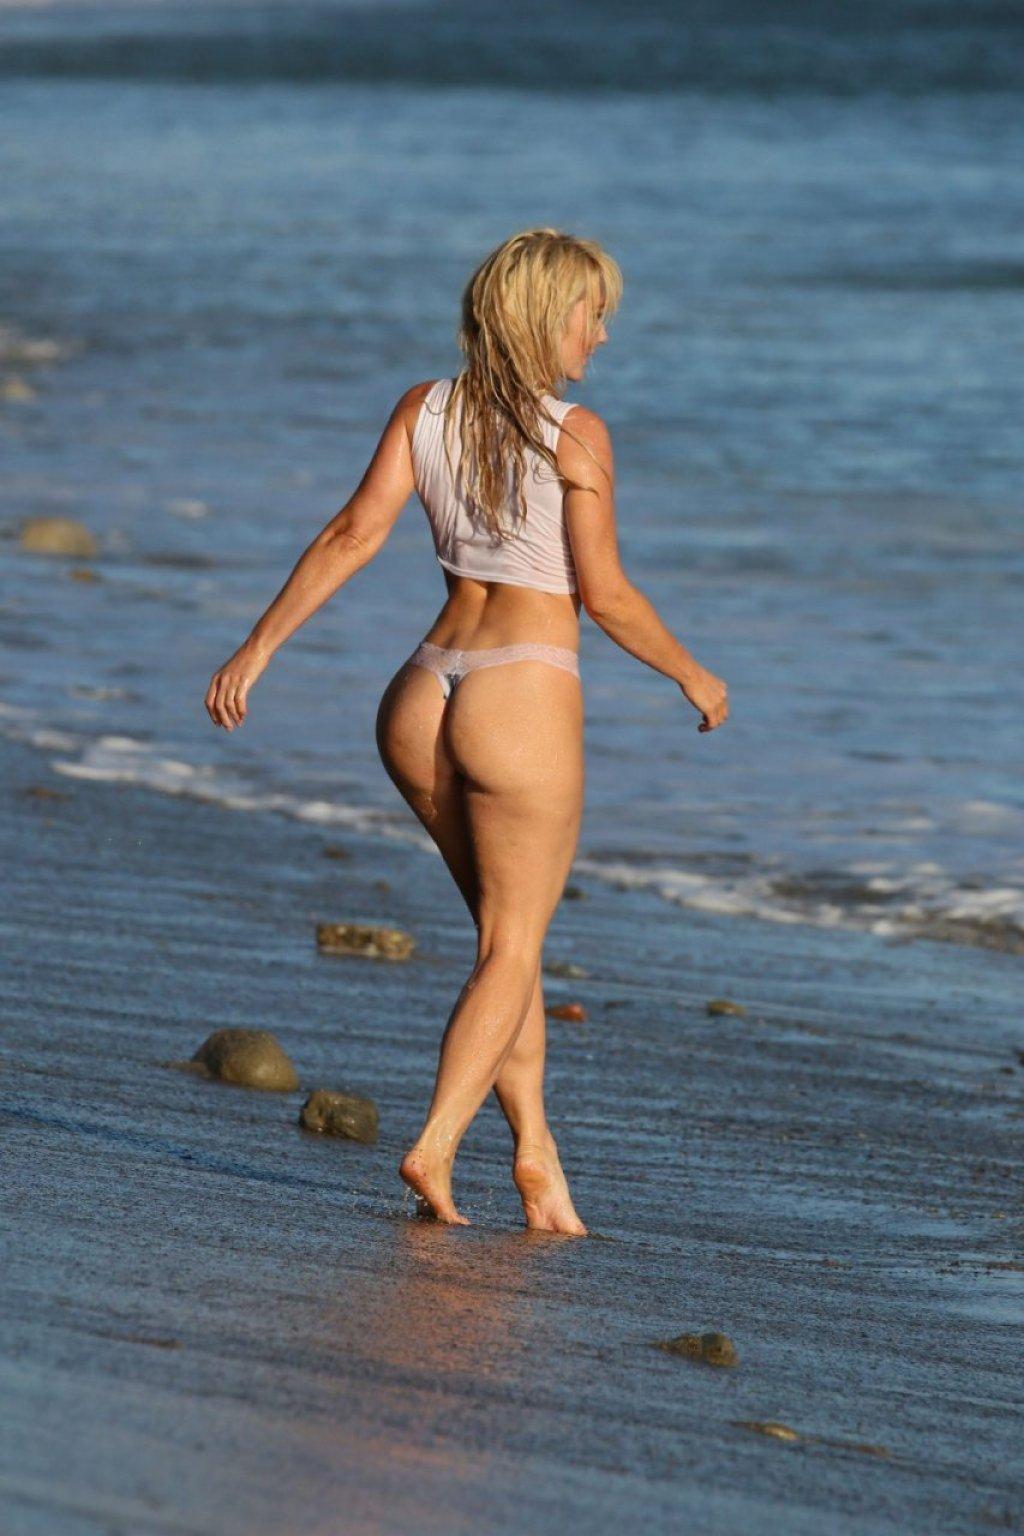 Nikki Lund See Through (16 Photos)